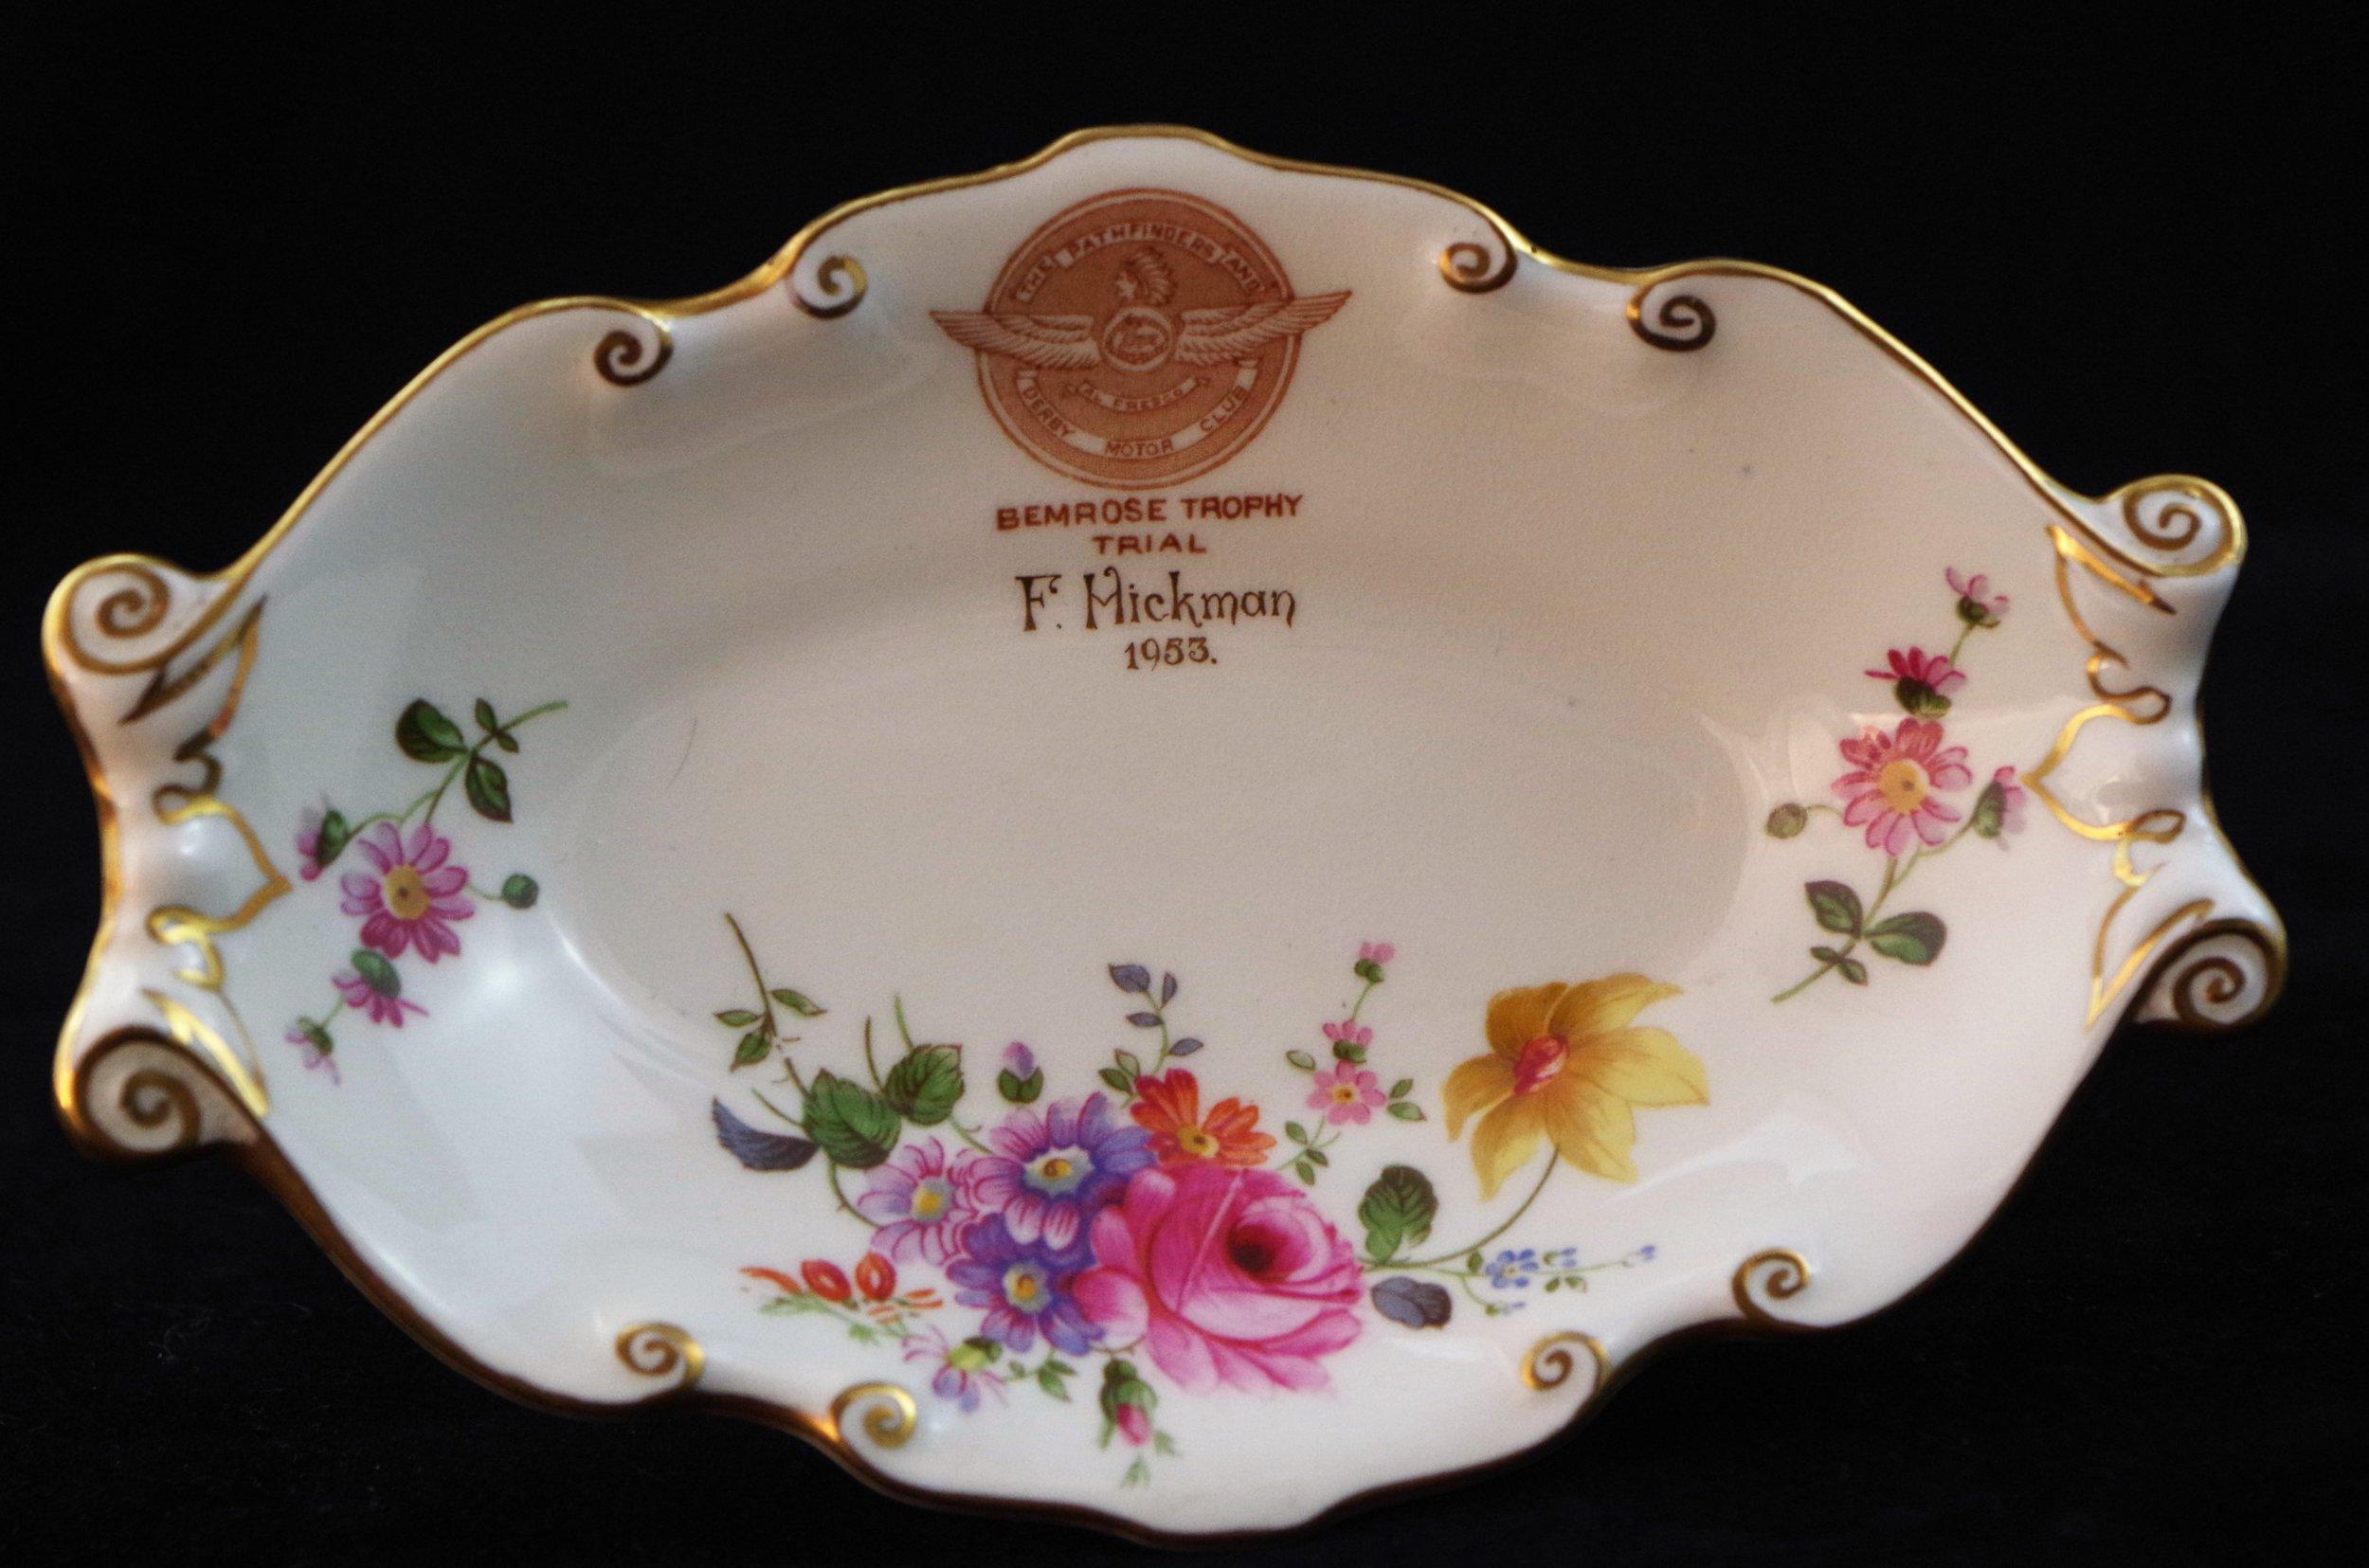 royal-crown-derby-silver-sweets-derby-posie-the-pathfinders-and-derby-motor-club-bemrose-trophy-trial-f-hickman-1953-A228